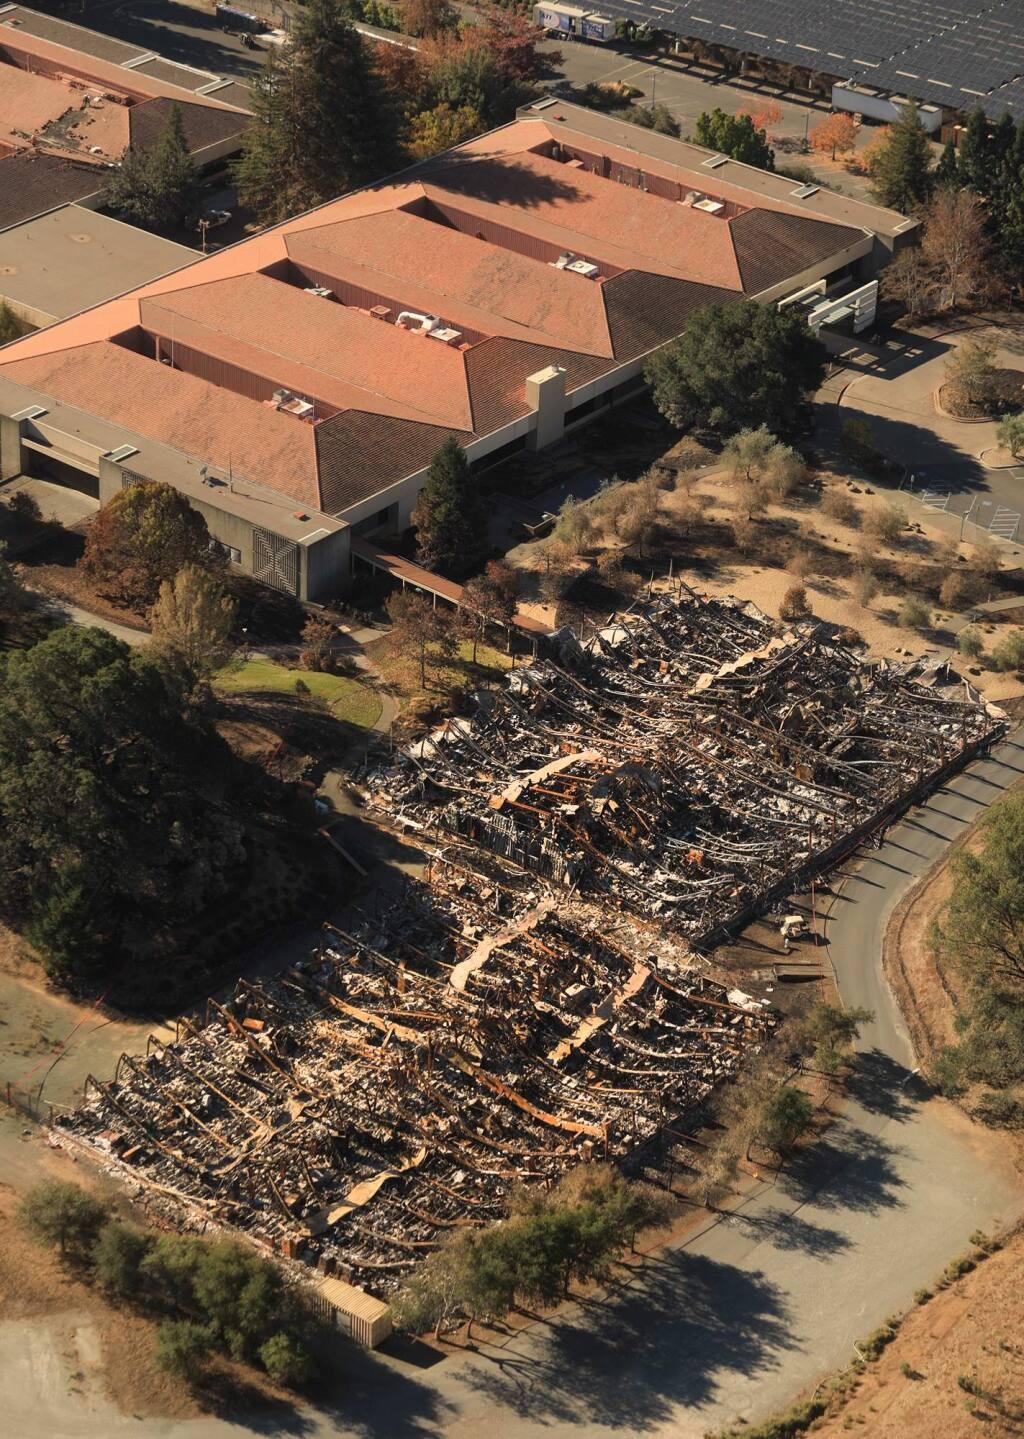 Key sight Technologies damage from the Tubbs fire in Santa Rosa, Wednesday Oct. 25, 2017. (Kent Porter / Press Democrat) 2017